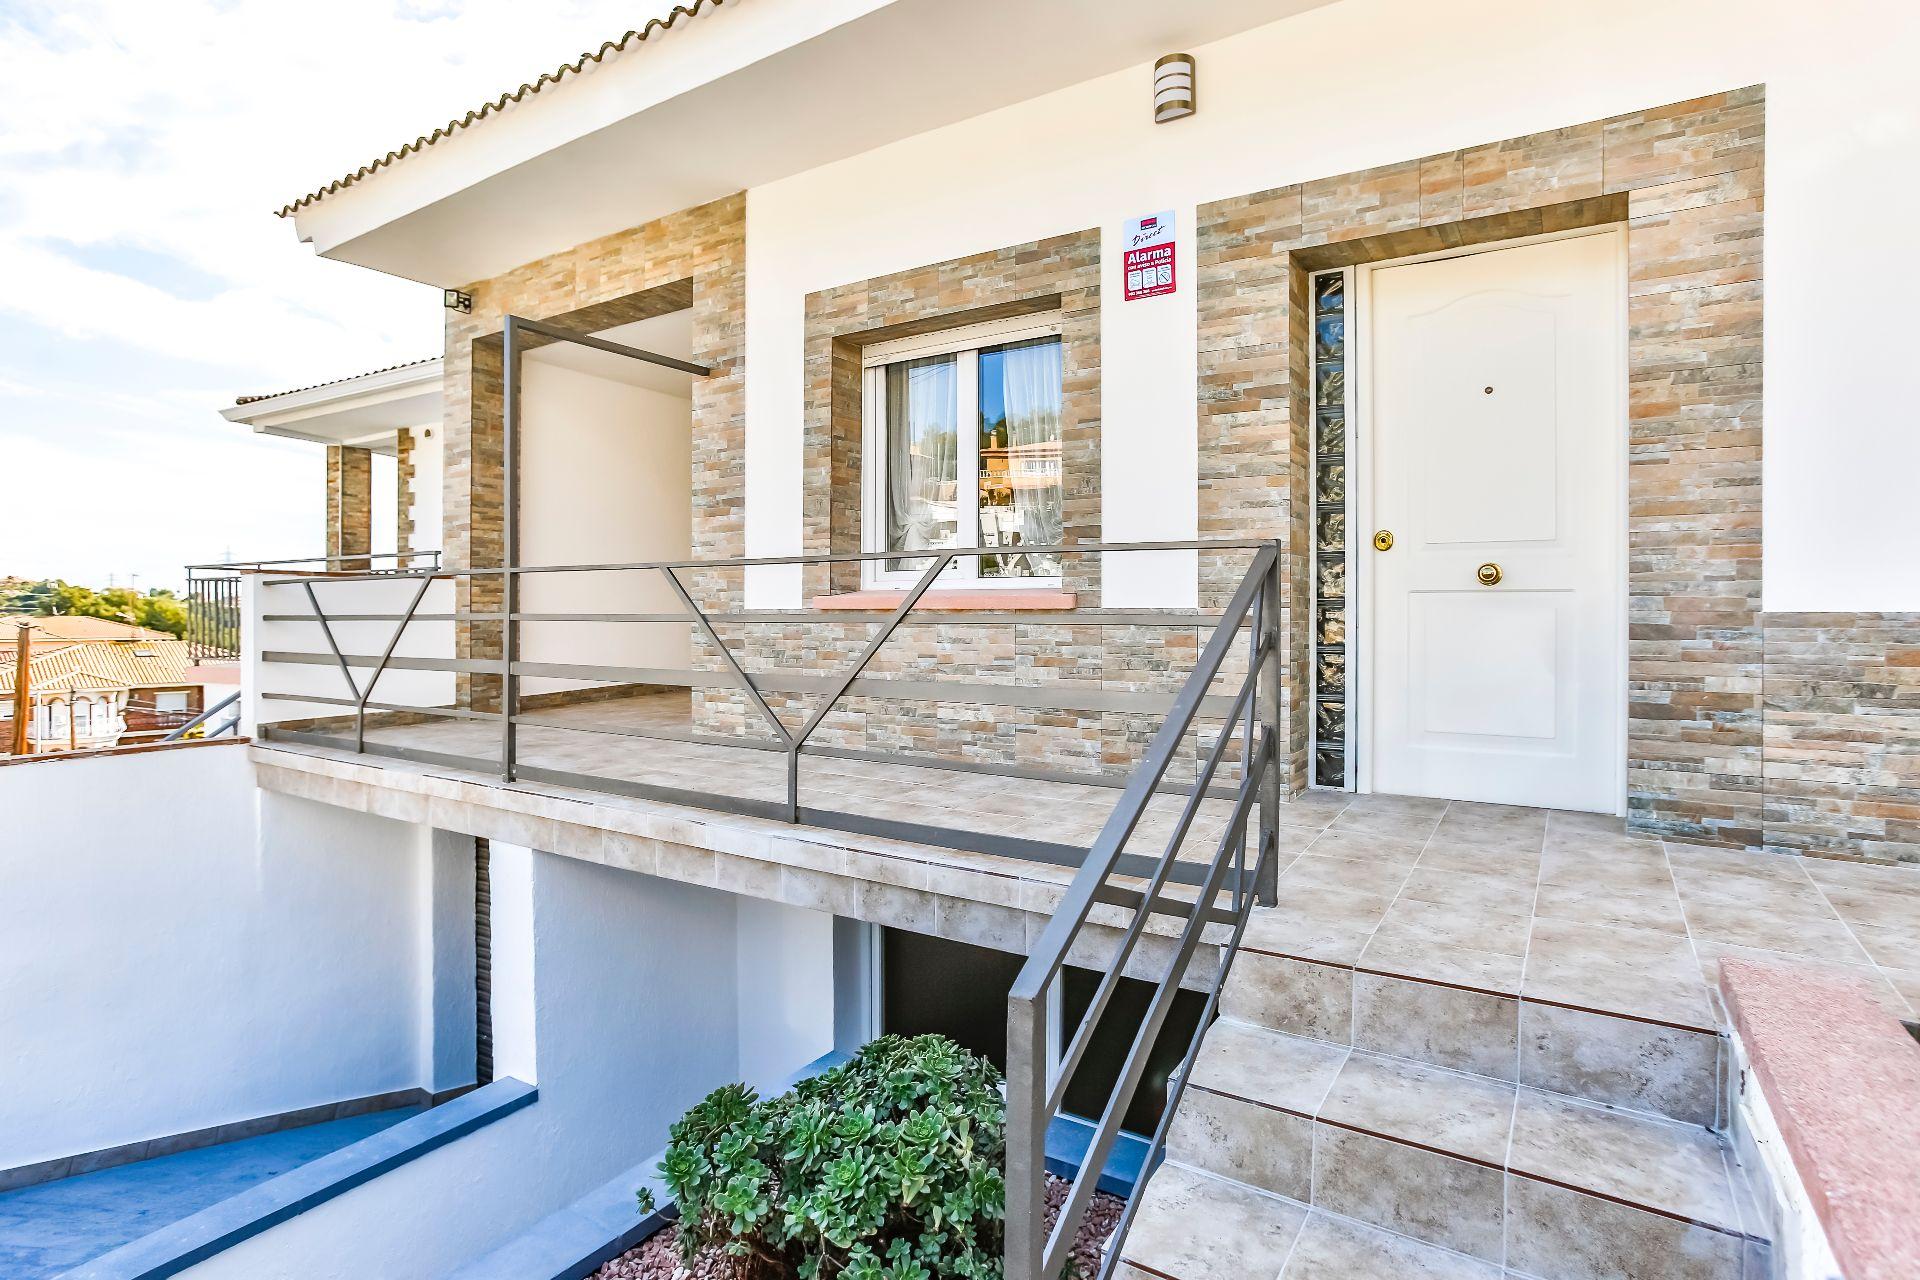 Casa / Chalet en Calafell, Segur de Calafell, venta